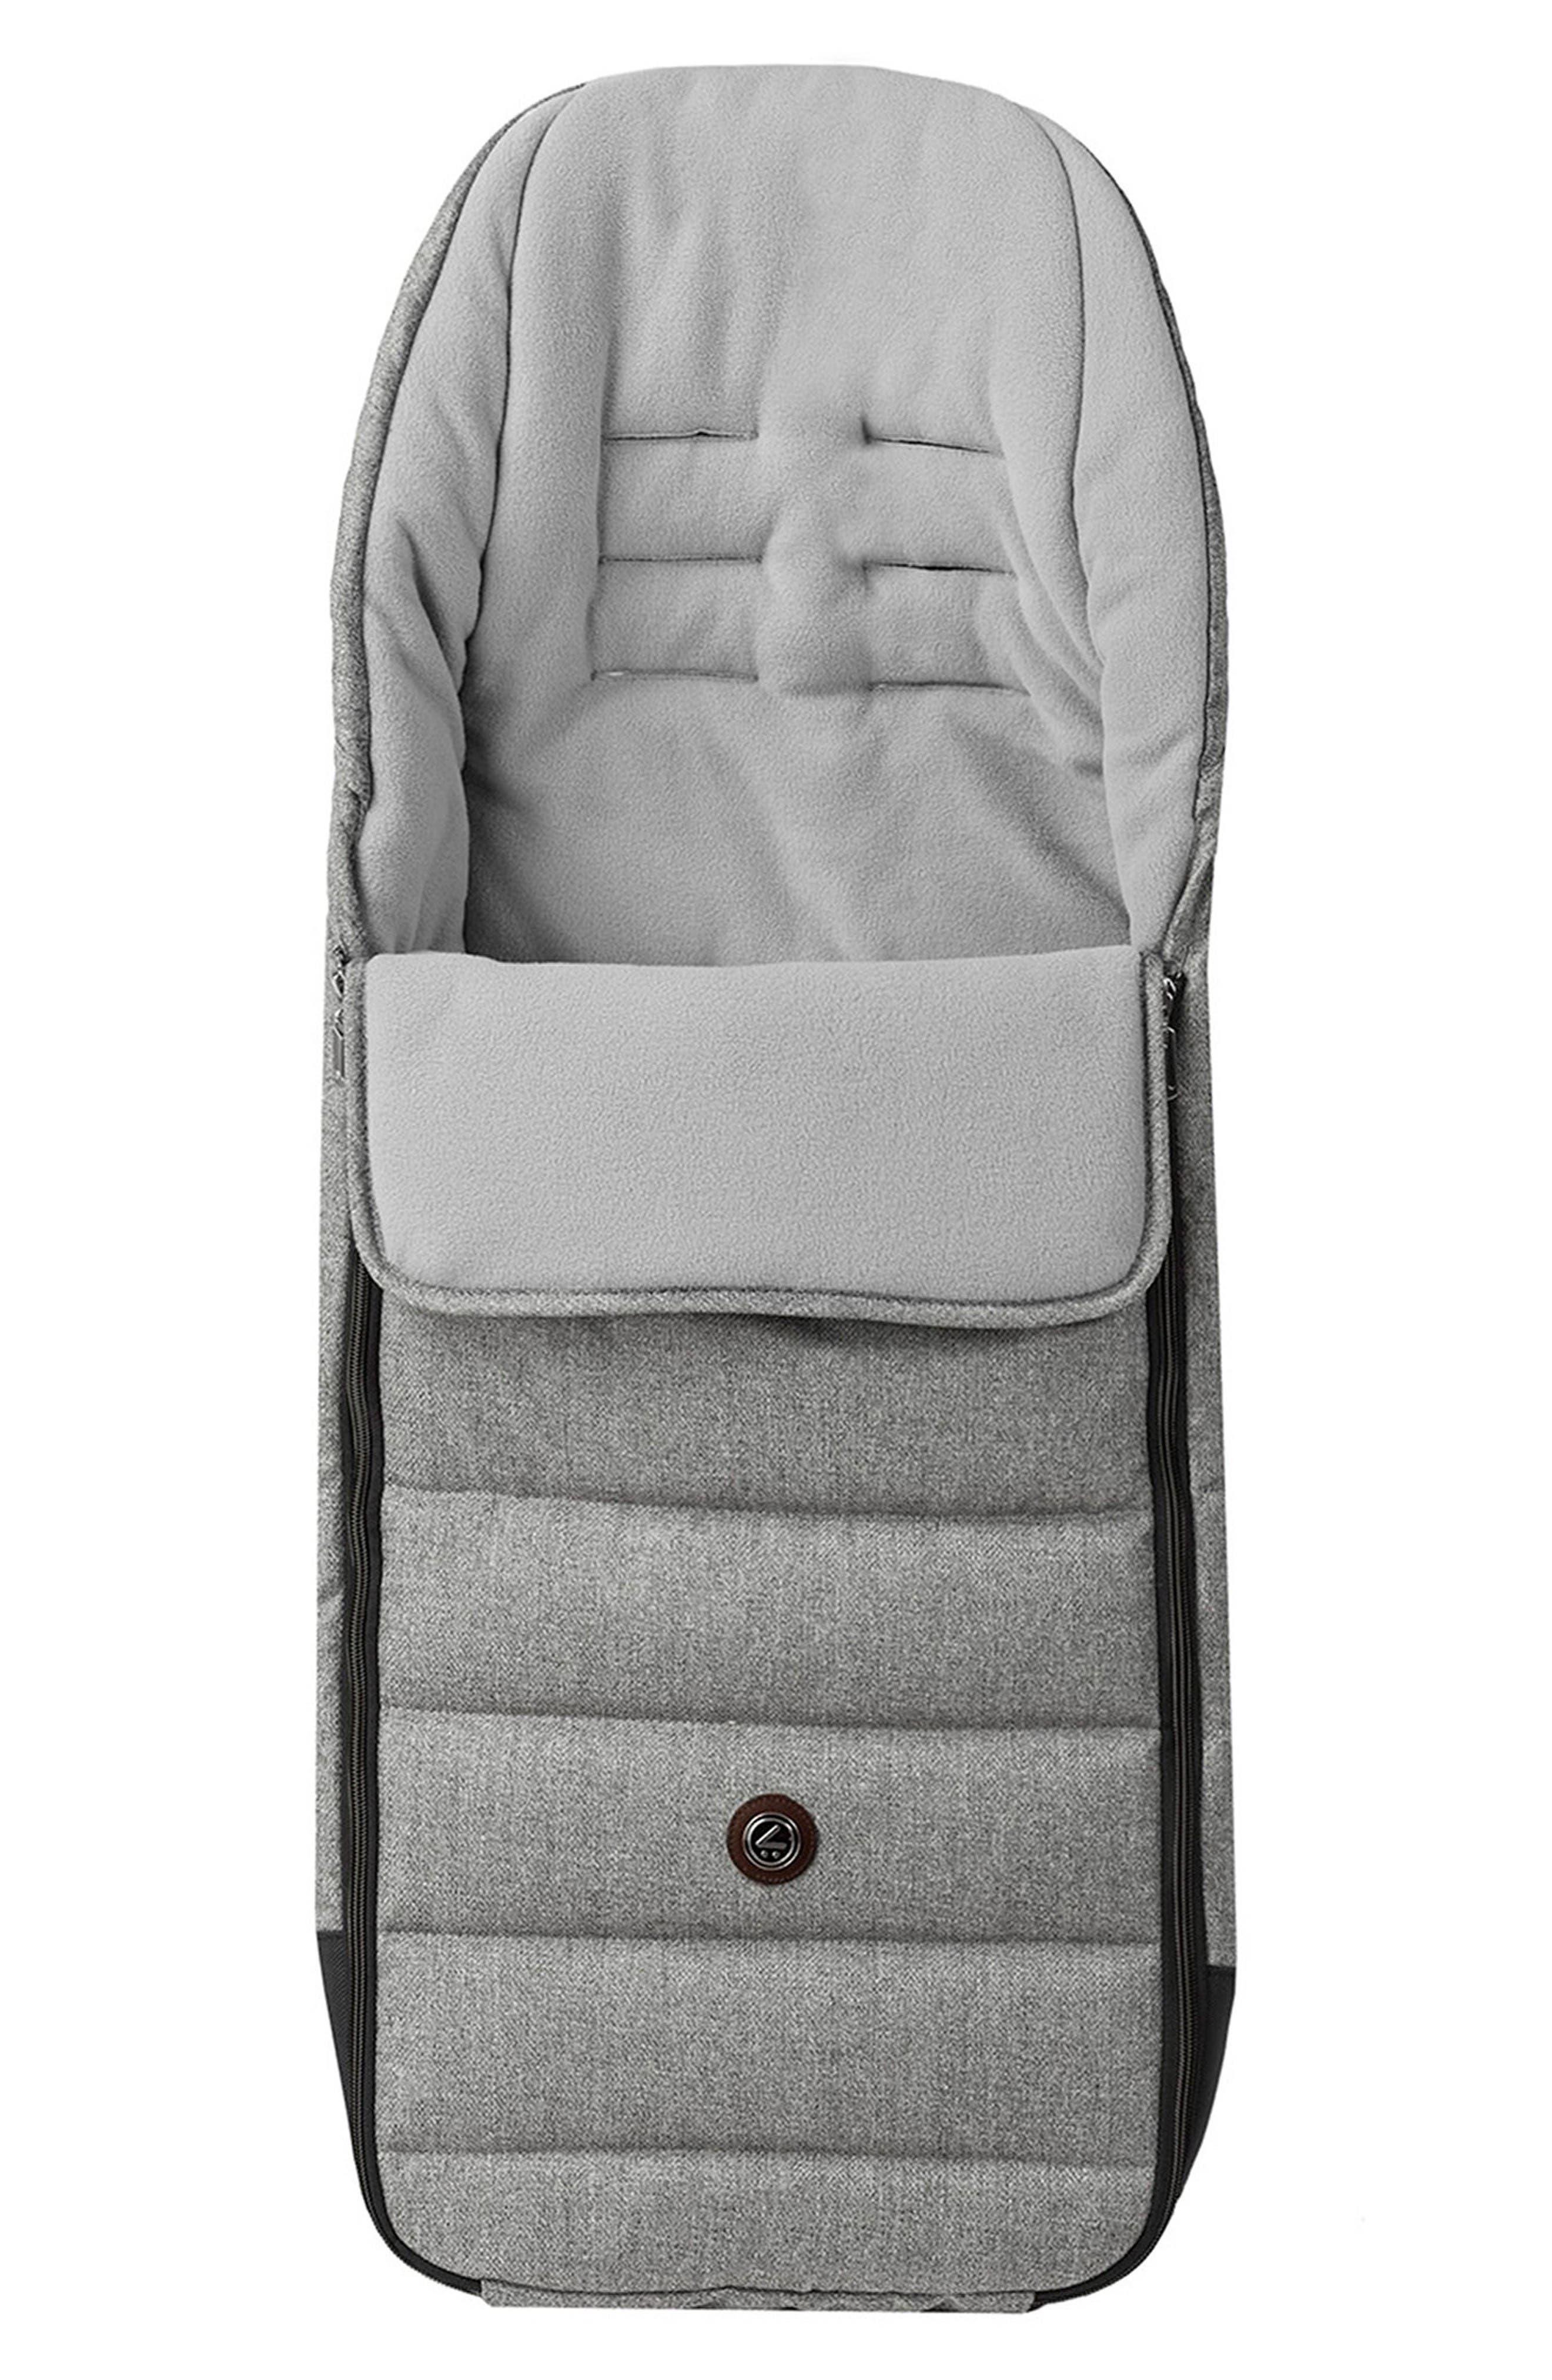 Igo - Heritage Dawn Stroller Footmuff,                         Main,                         color, Grey